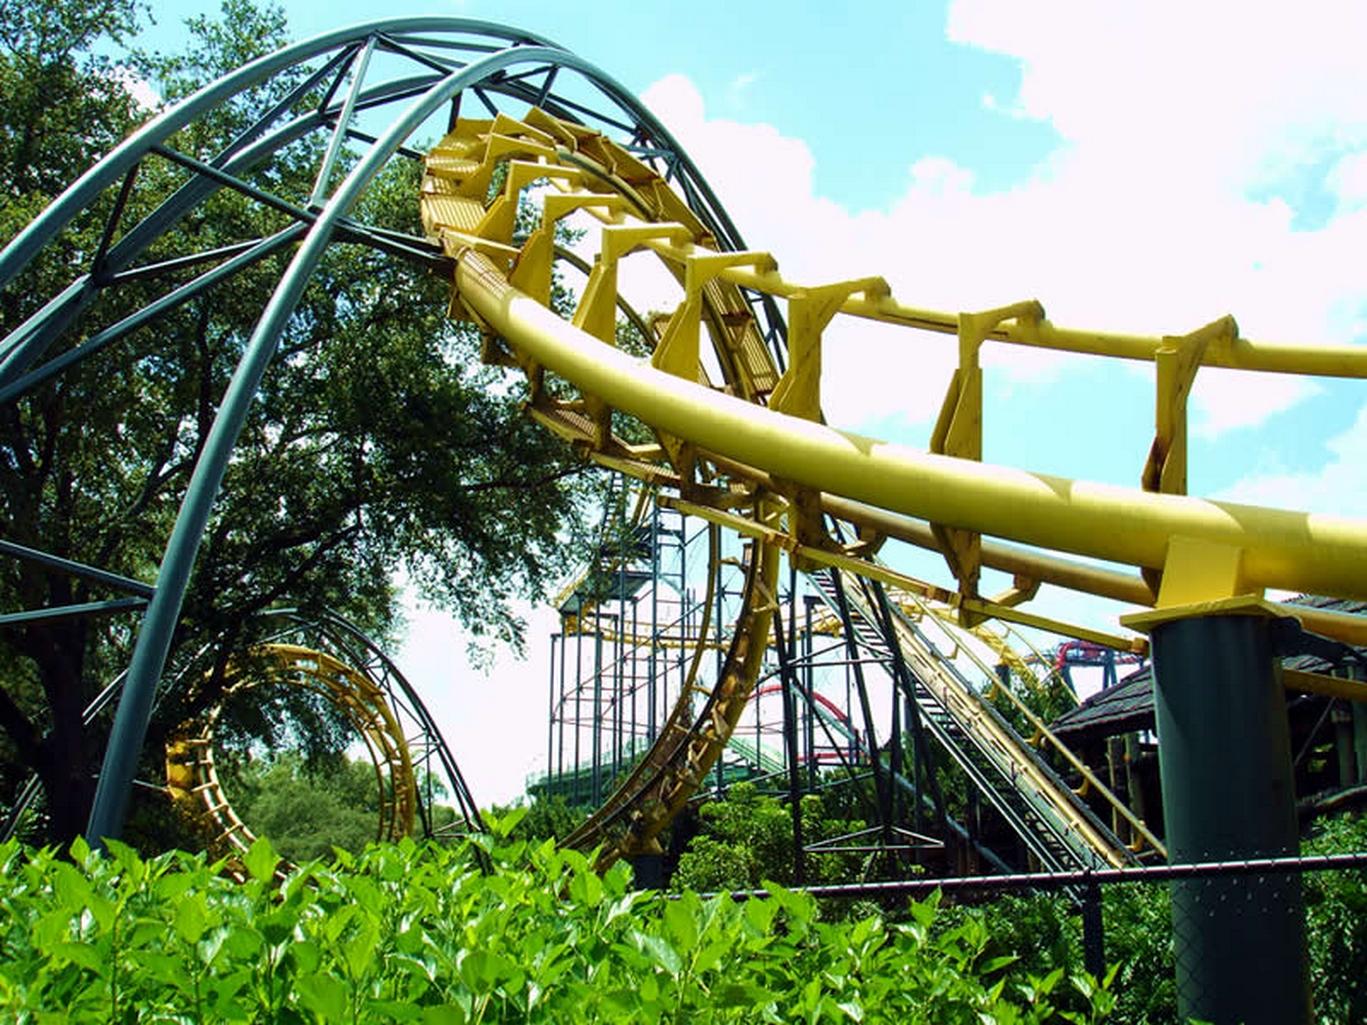 Python Busch Gardens Tampa Bay Wikiwand